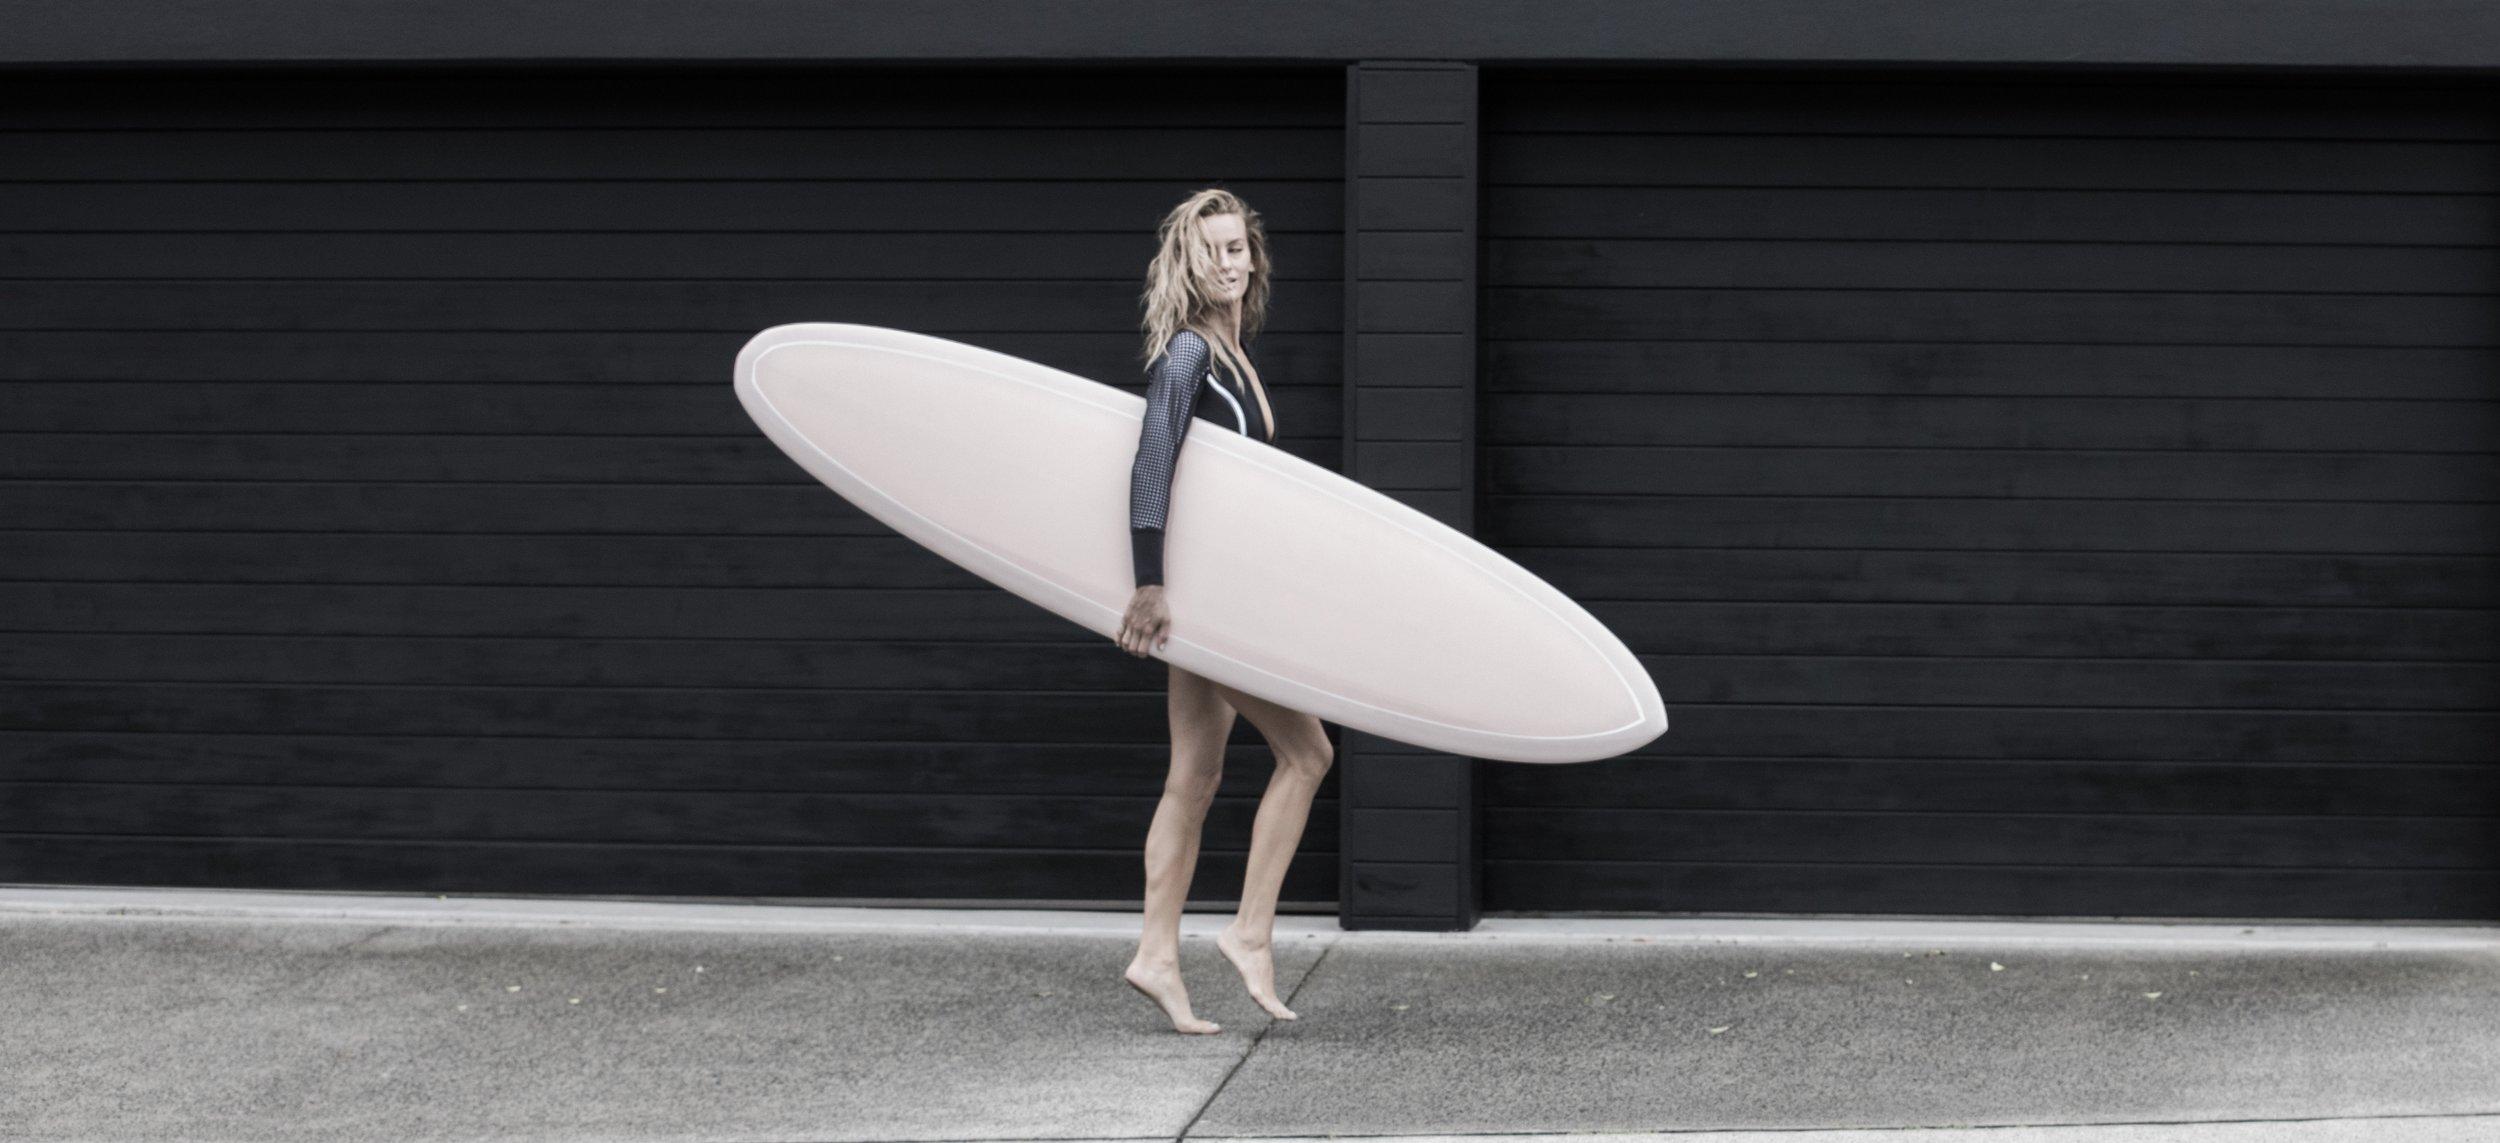 SW_SURFBOARDS_SCOTTEHLER_002.jpg